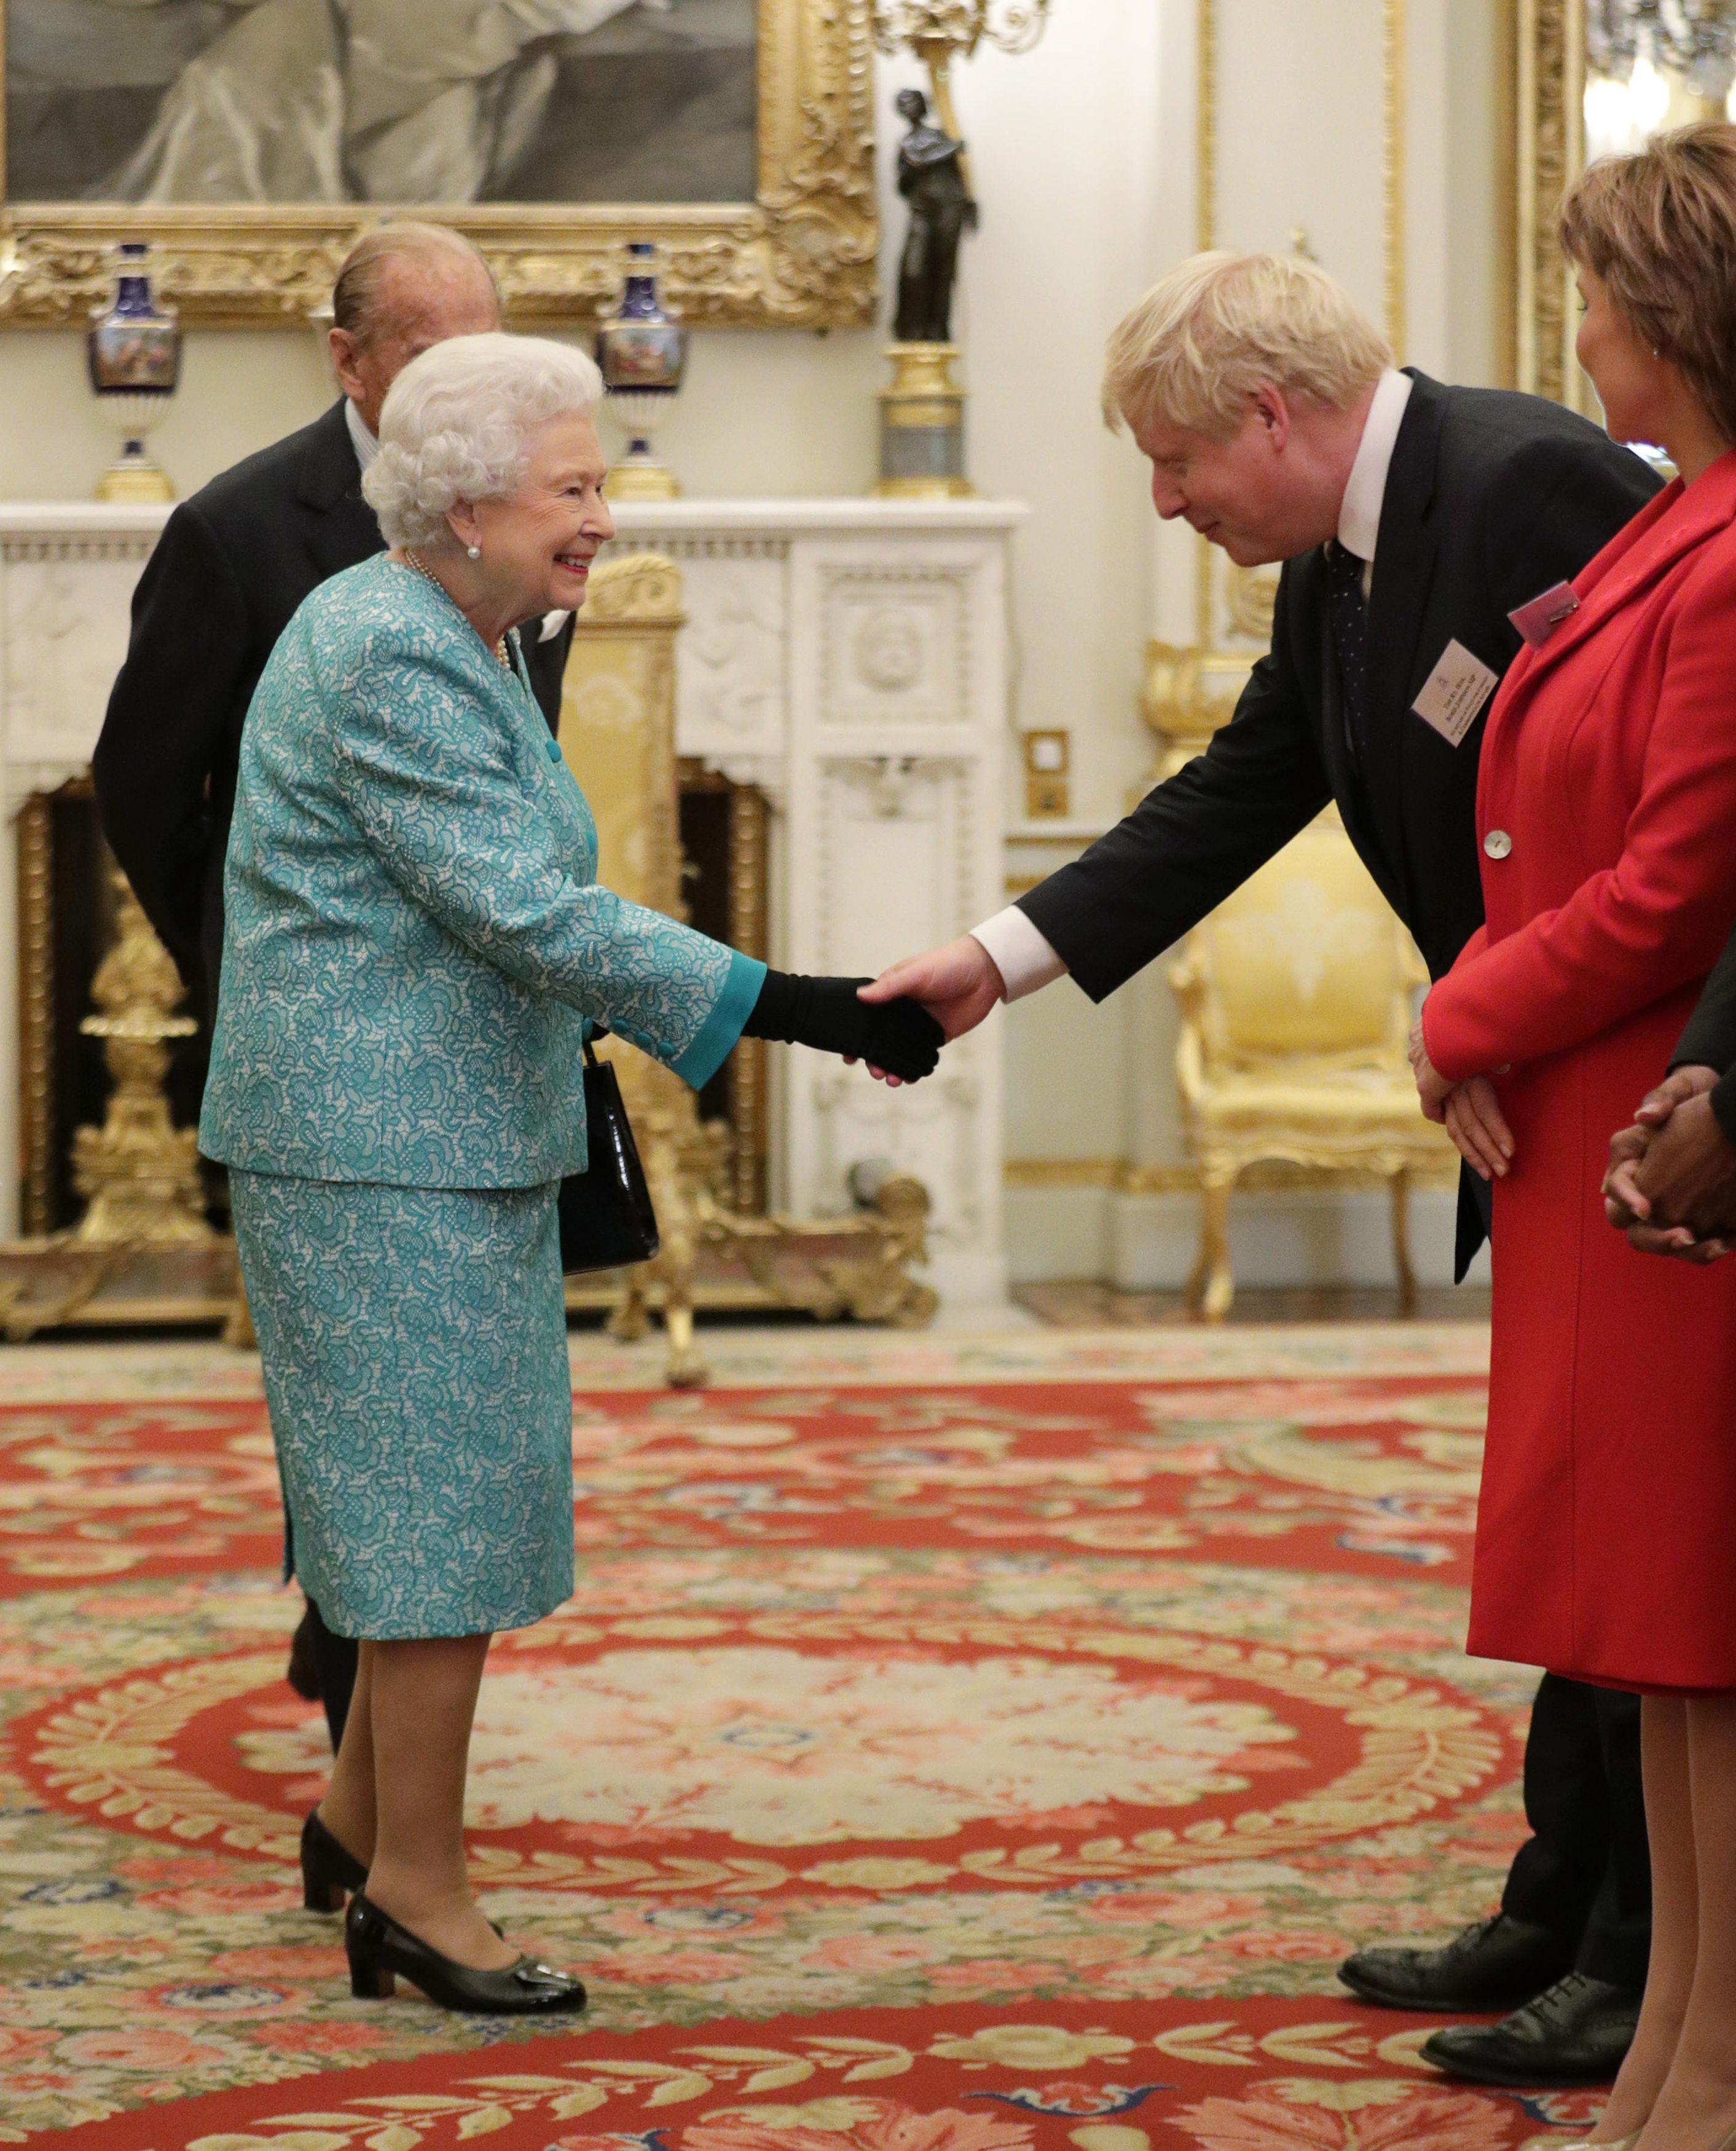 Boris Johnson is new Prime Minister